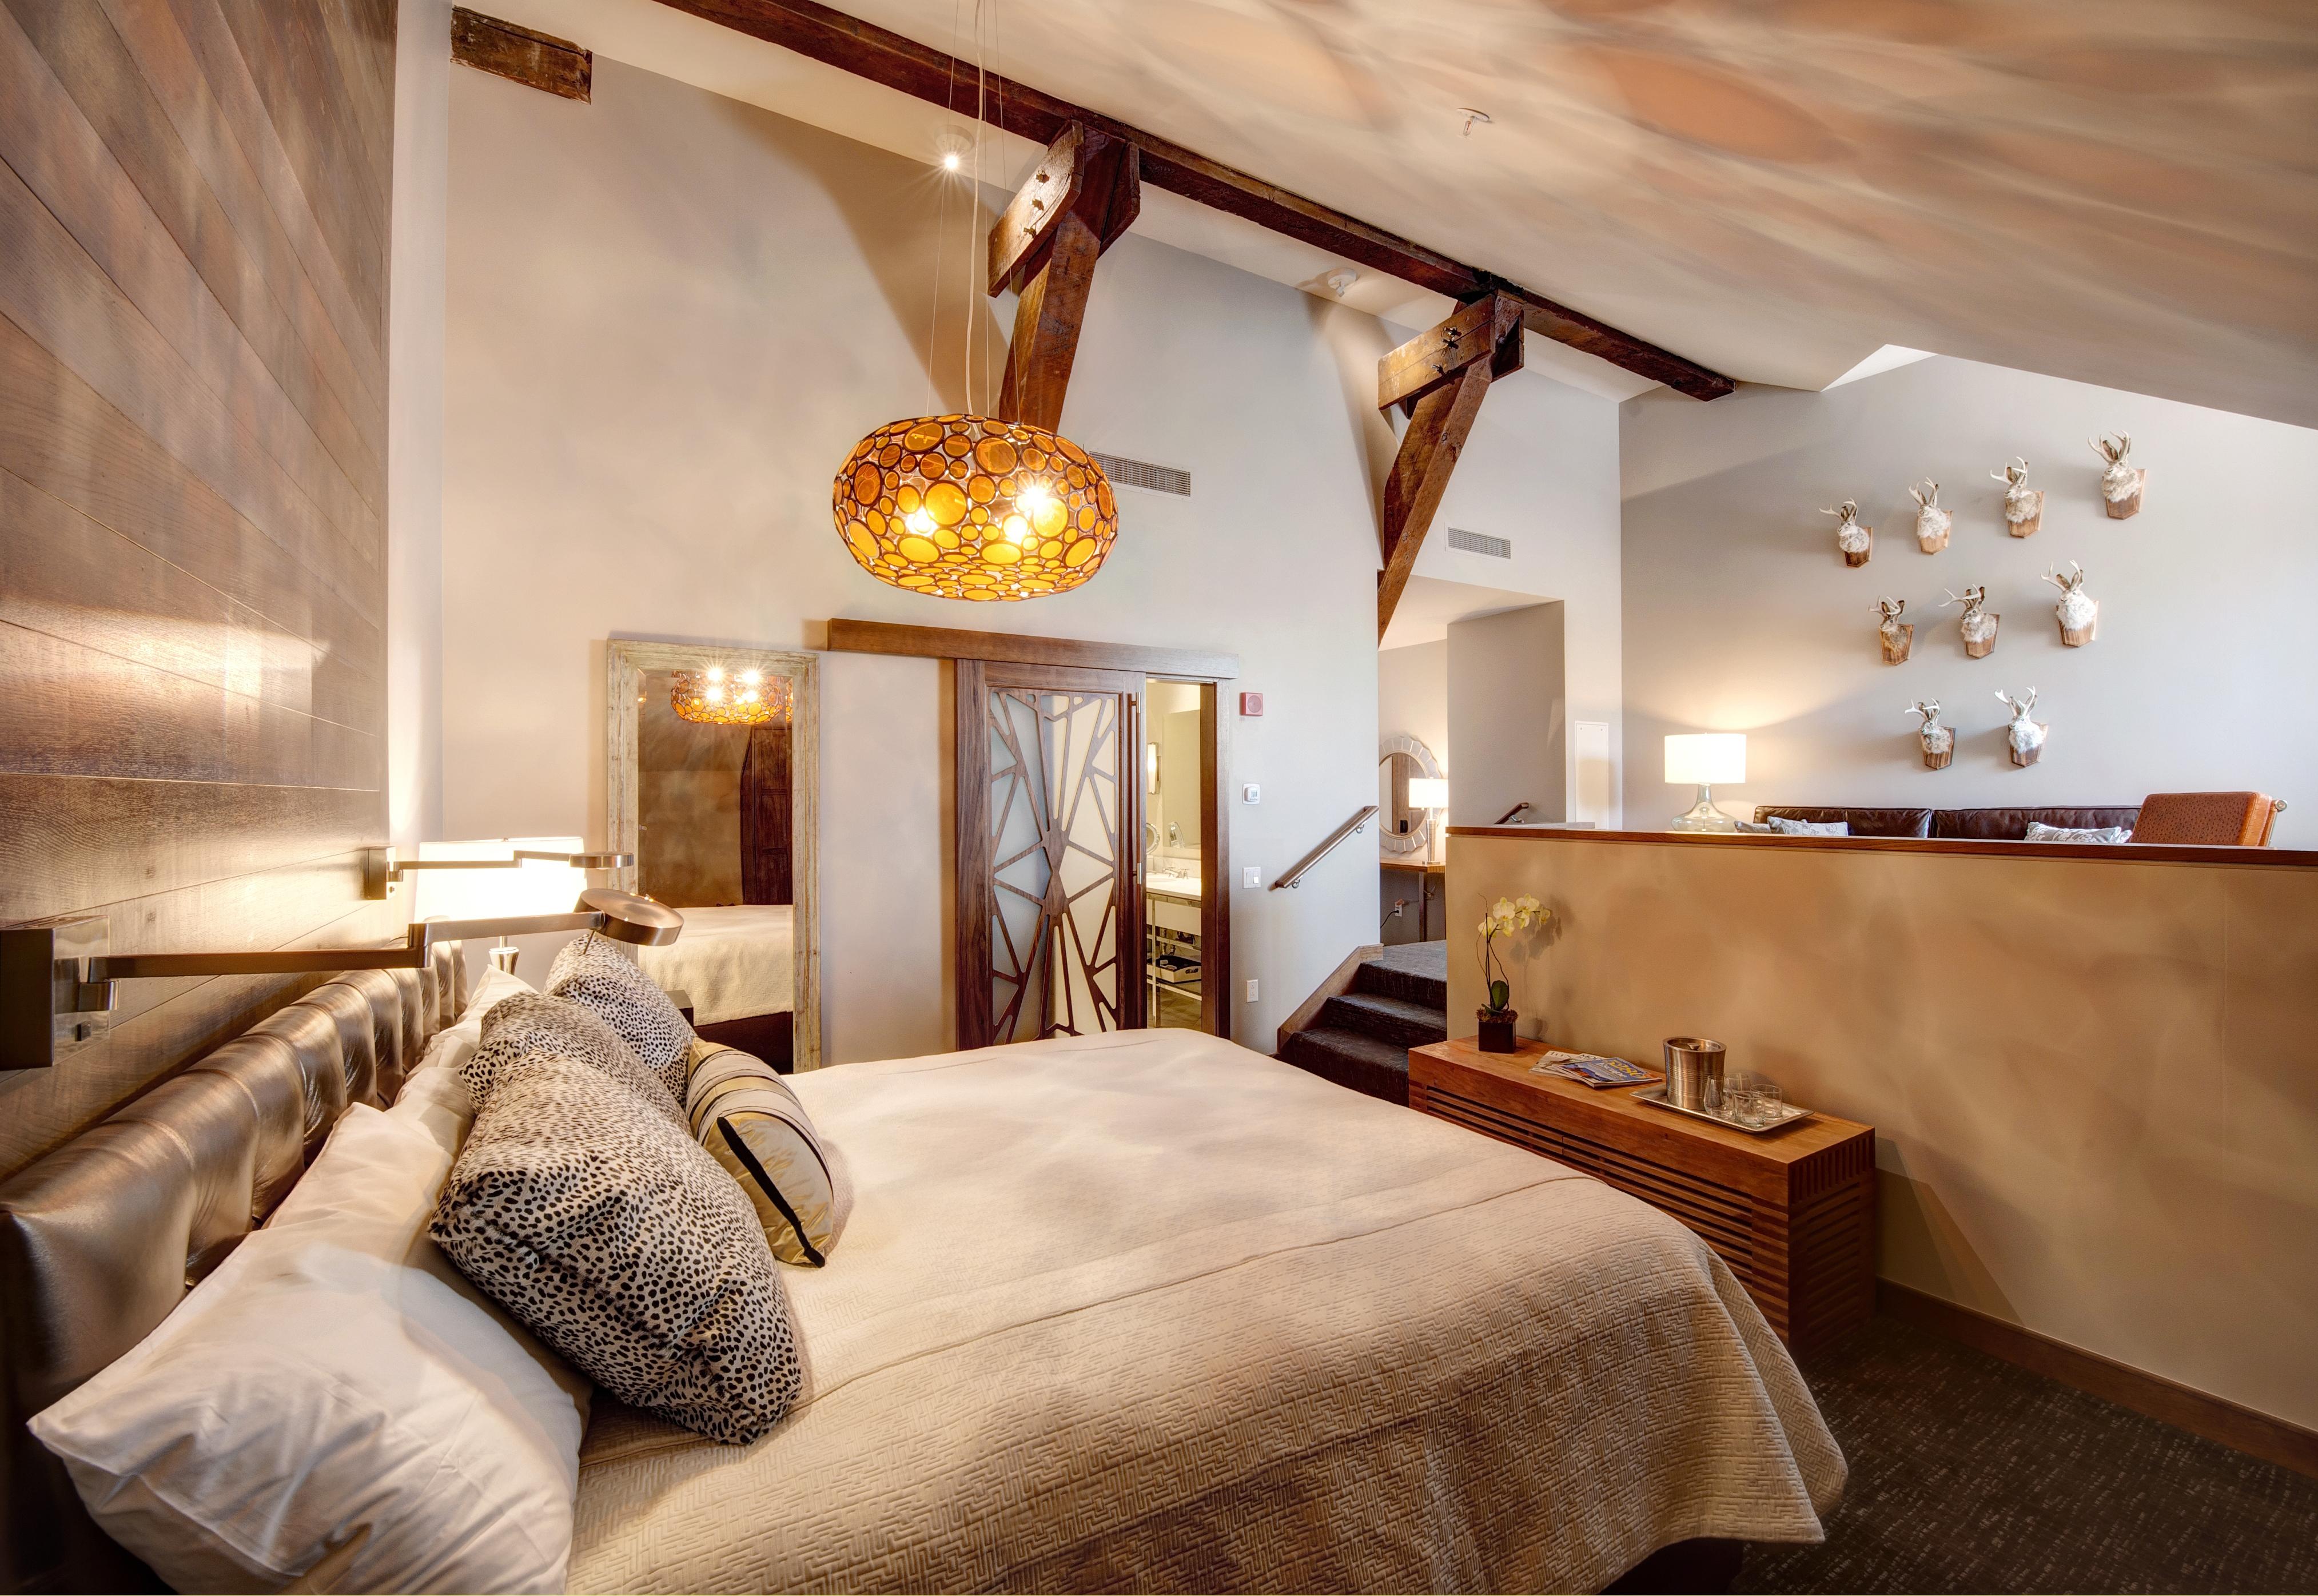 Remarkable Romantic Denver Hotels Visit Denver Download Free Architecture Designs Viewormadebymaigaardcom